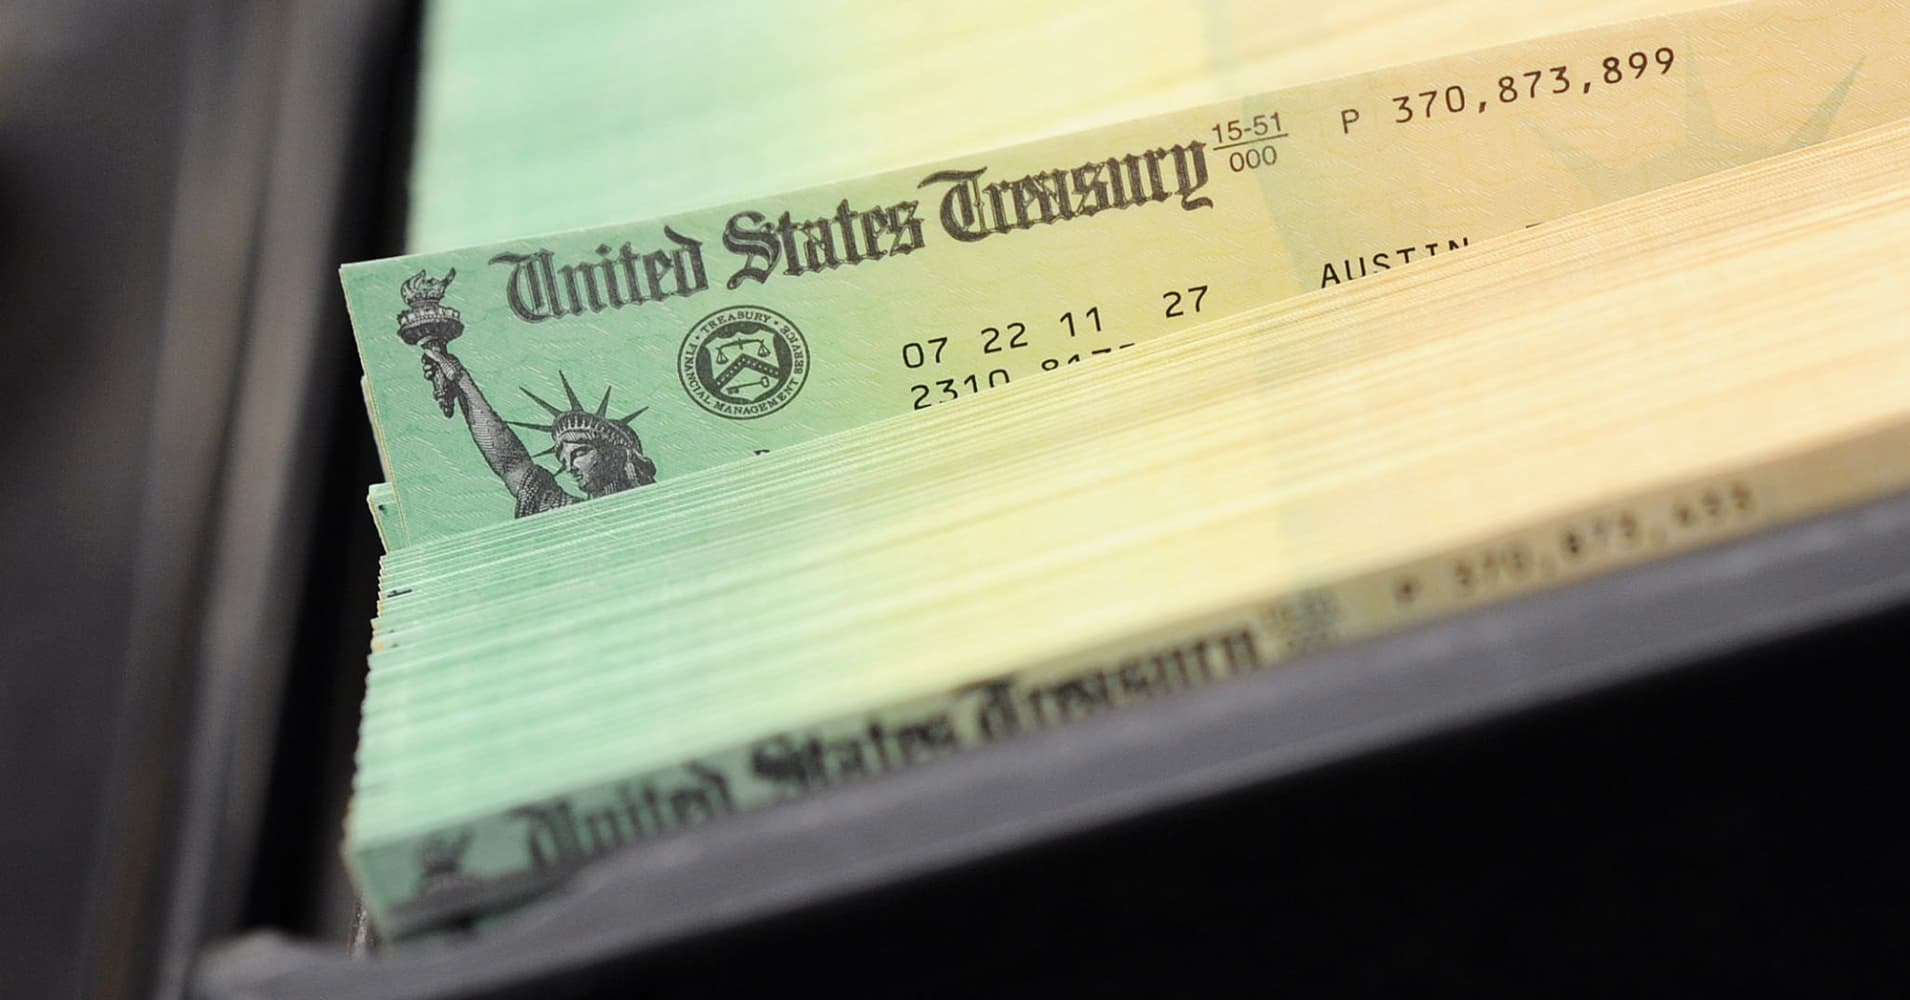 IRS confirms tax season will start Jan. 28, despite government shutdown